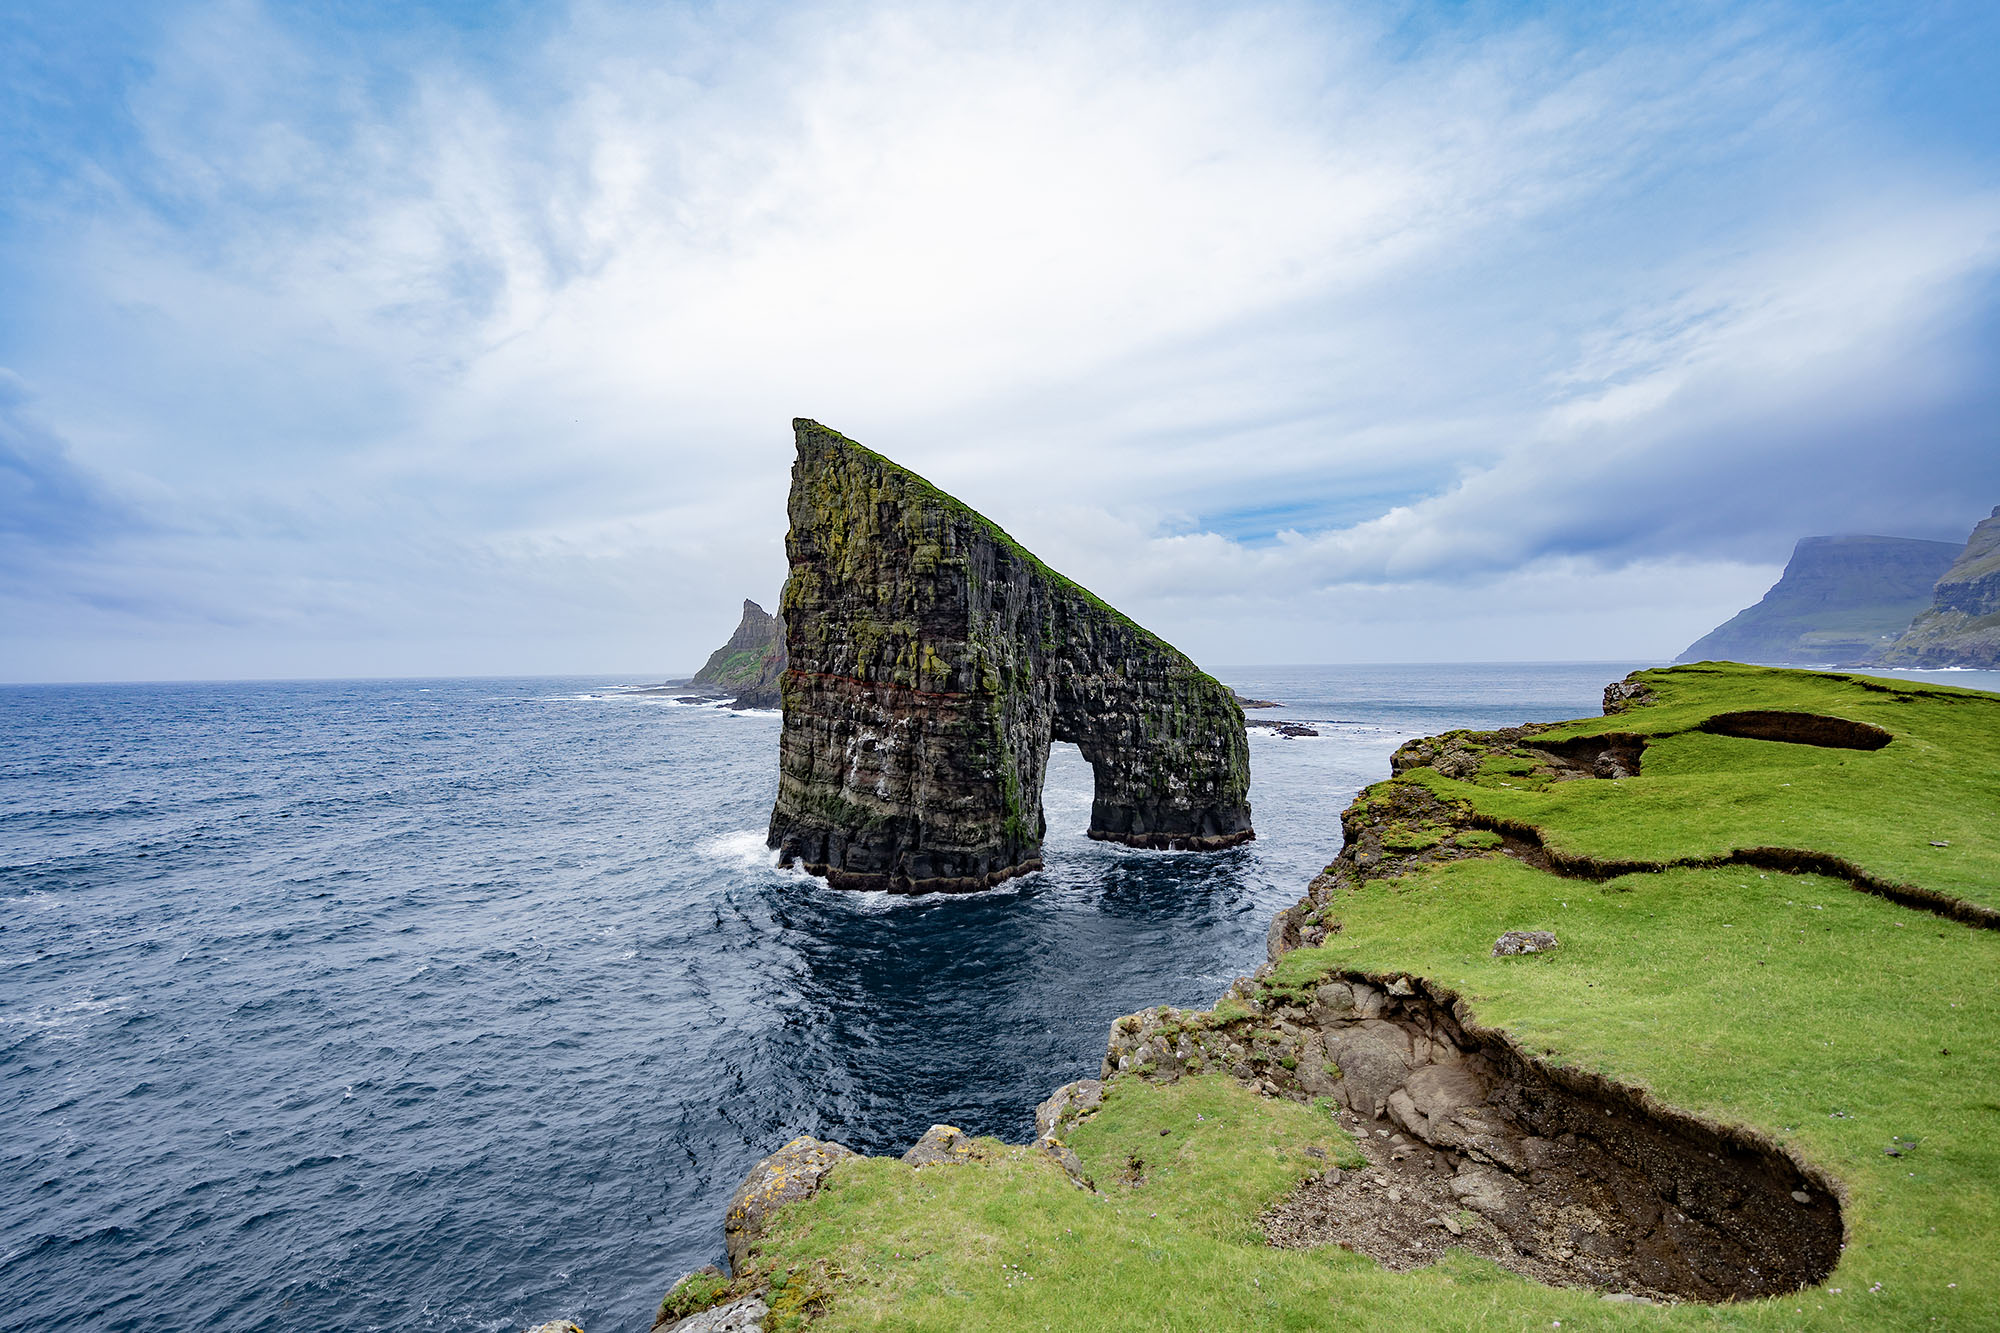 Amazing dramatic view of Drangarnir gate in front of Tindholmur in Vagar island, Faroe Islands